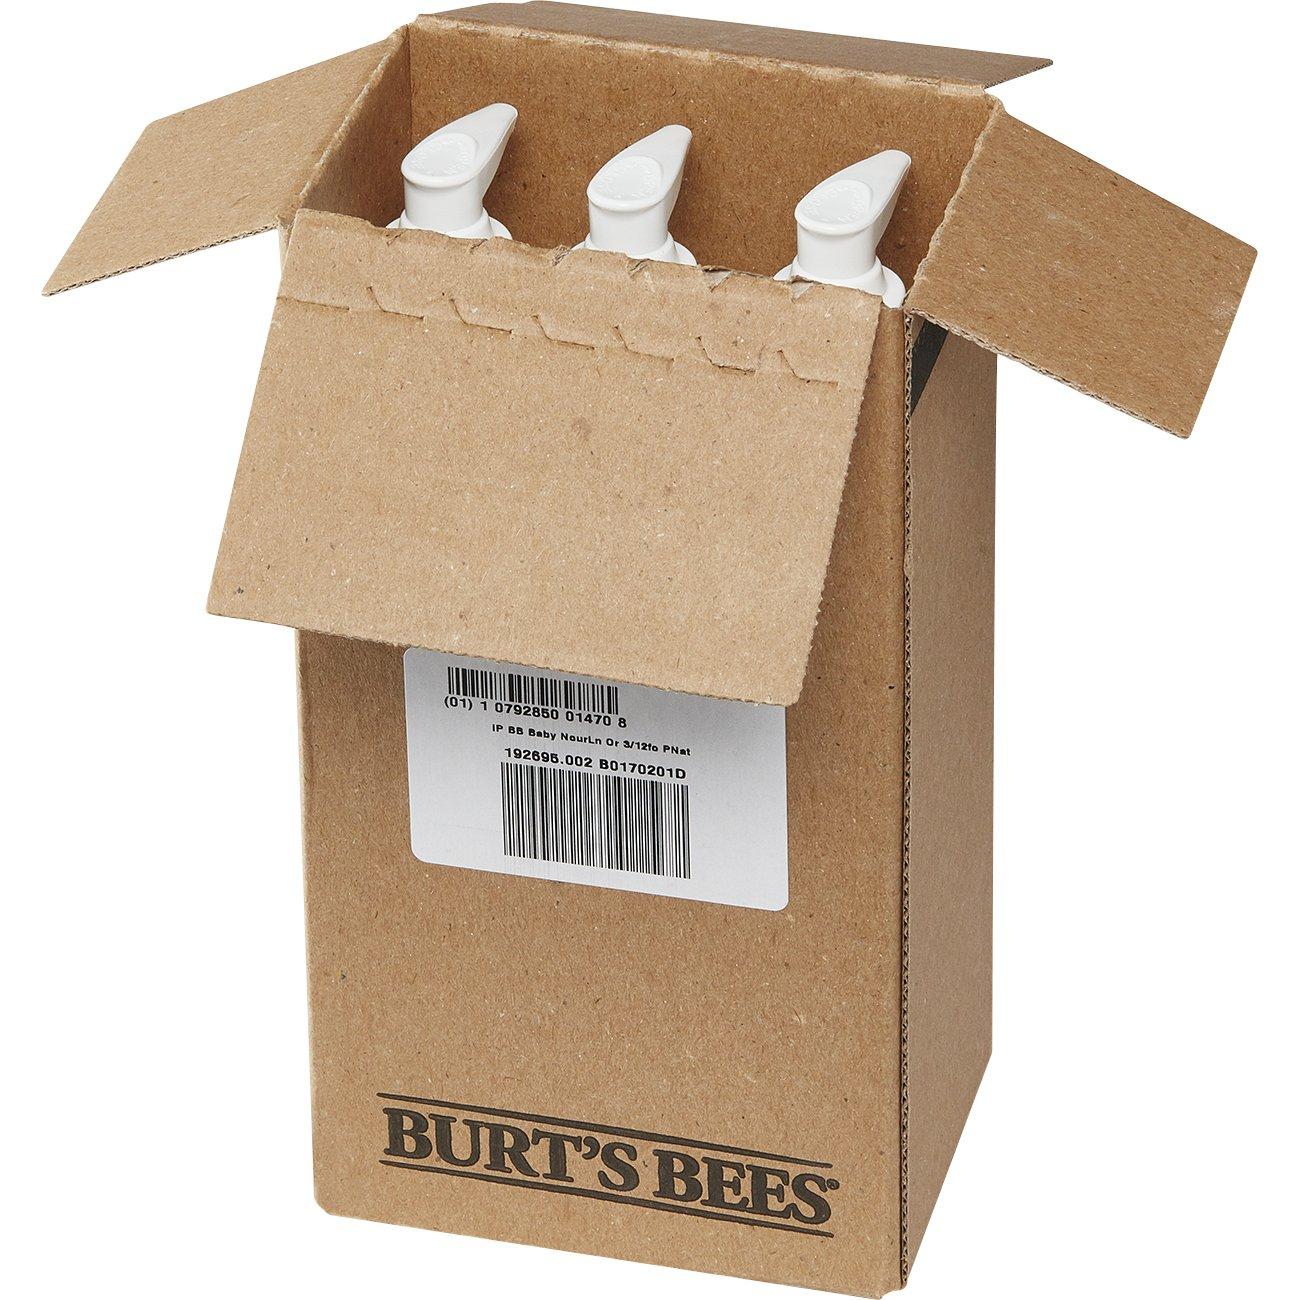 Burt's Bees Baby Nourishing Lotion, Original, 12 Ounces (Pack of 3) by Burt's Bees (Image #4)